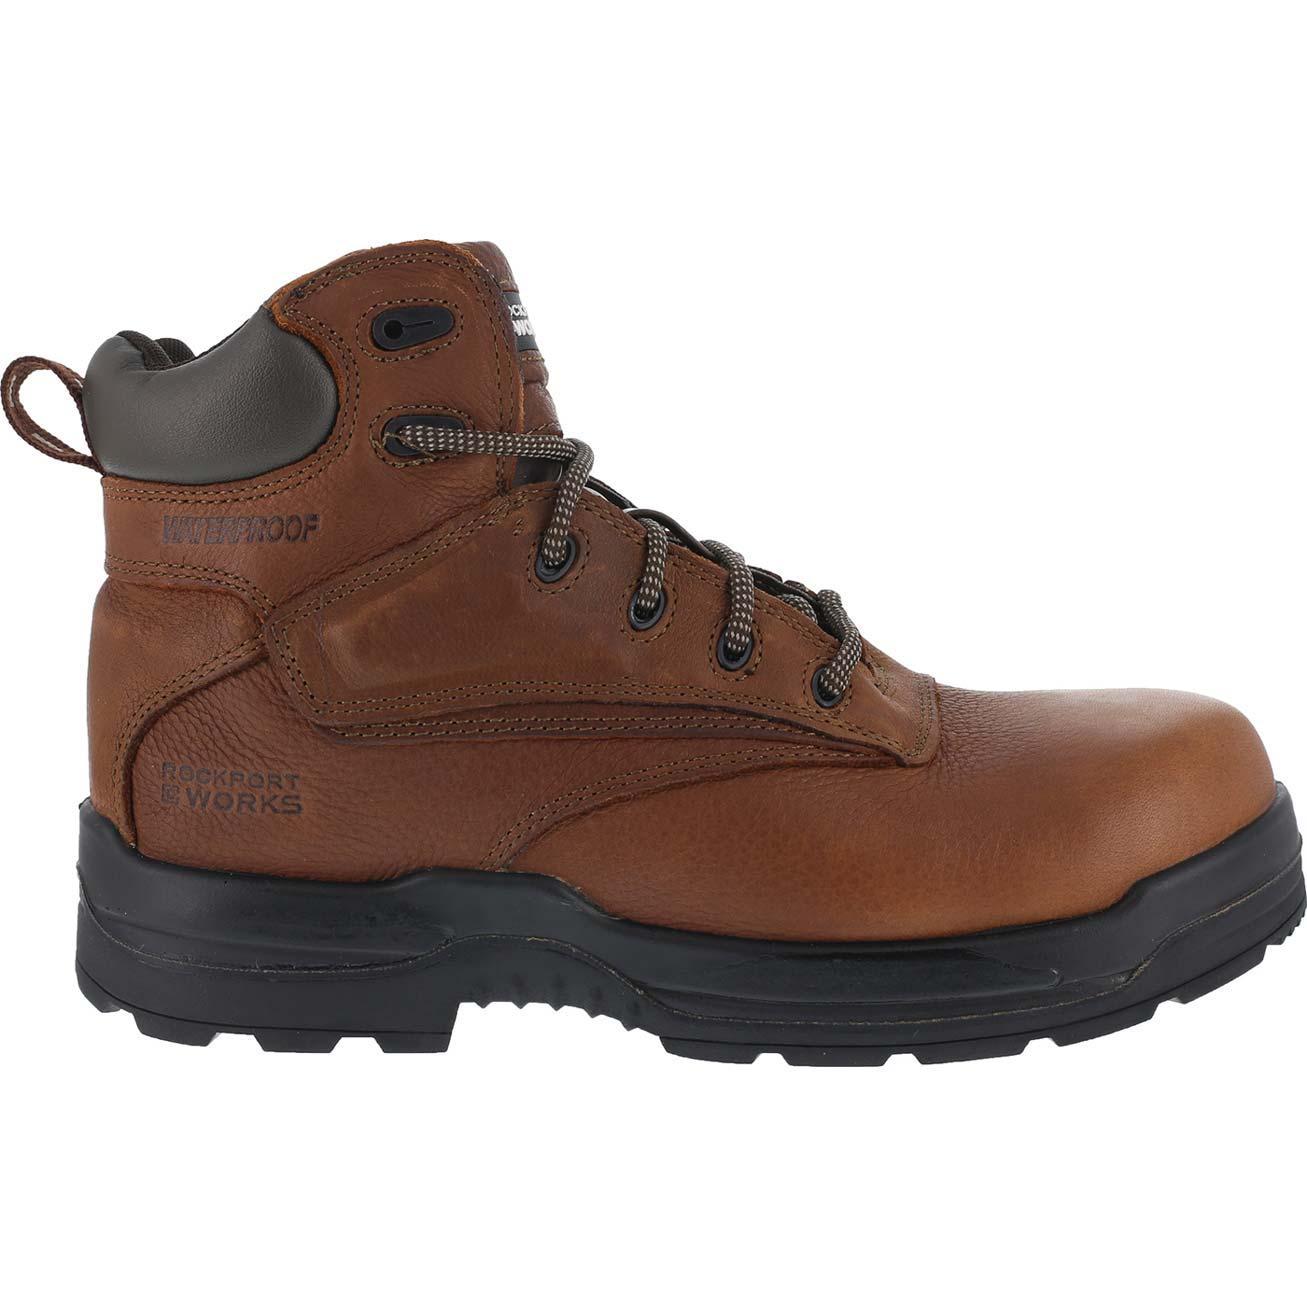 Rockport Work Shoes Composite Toe